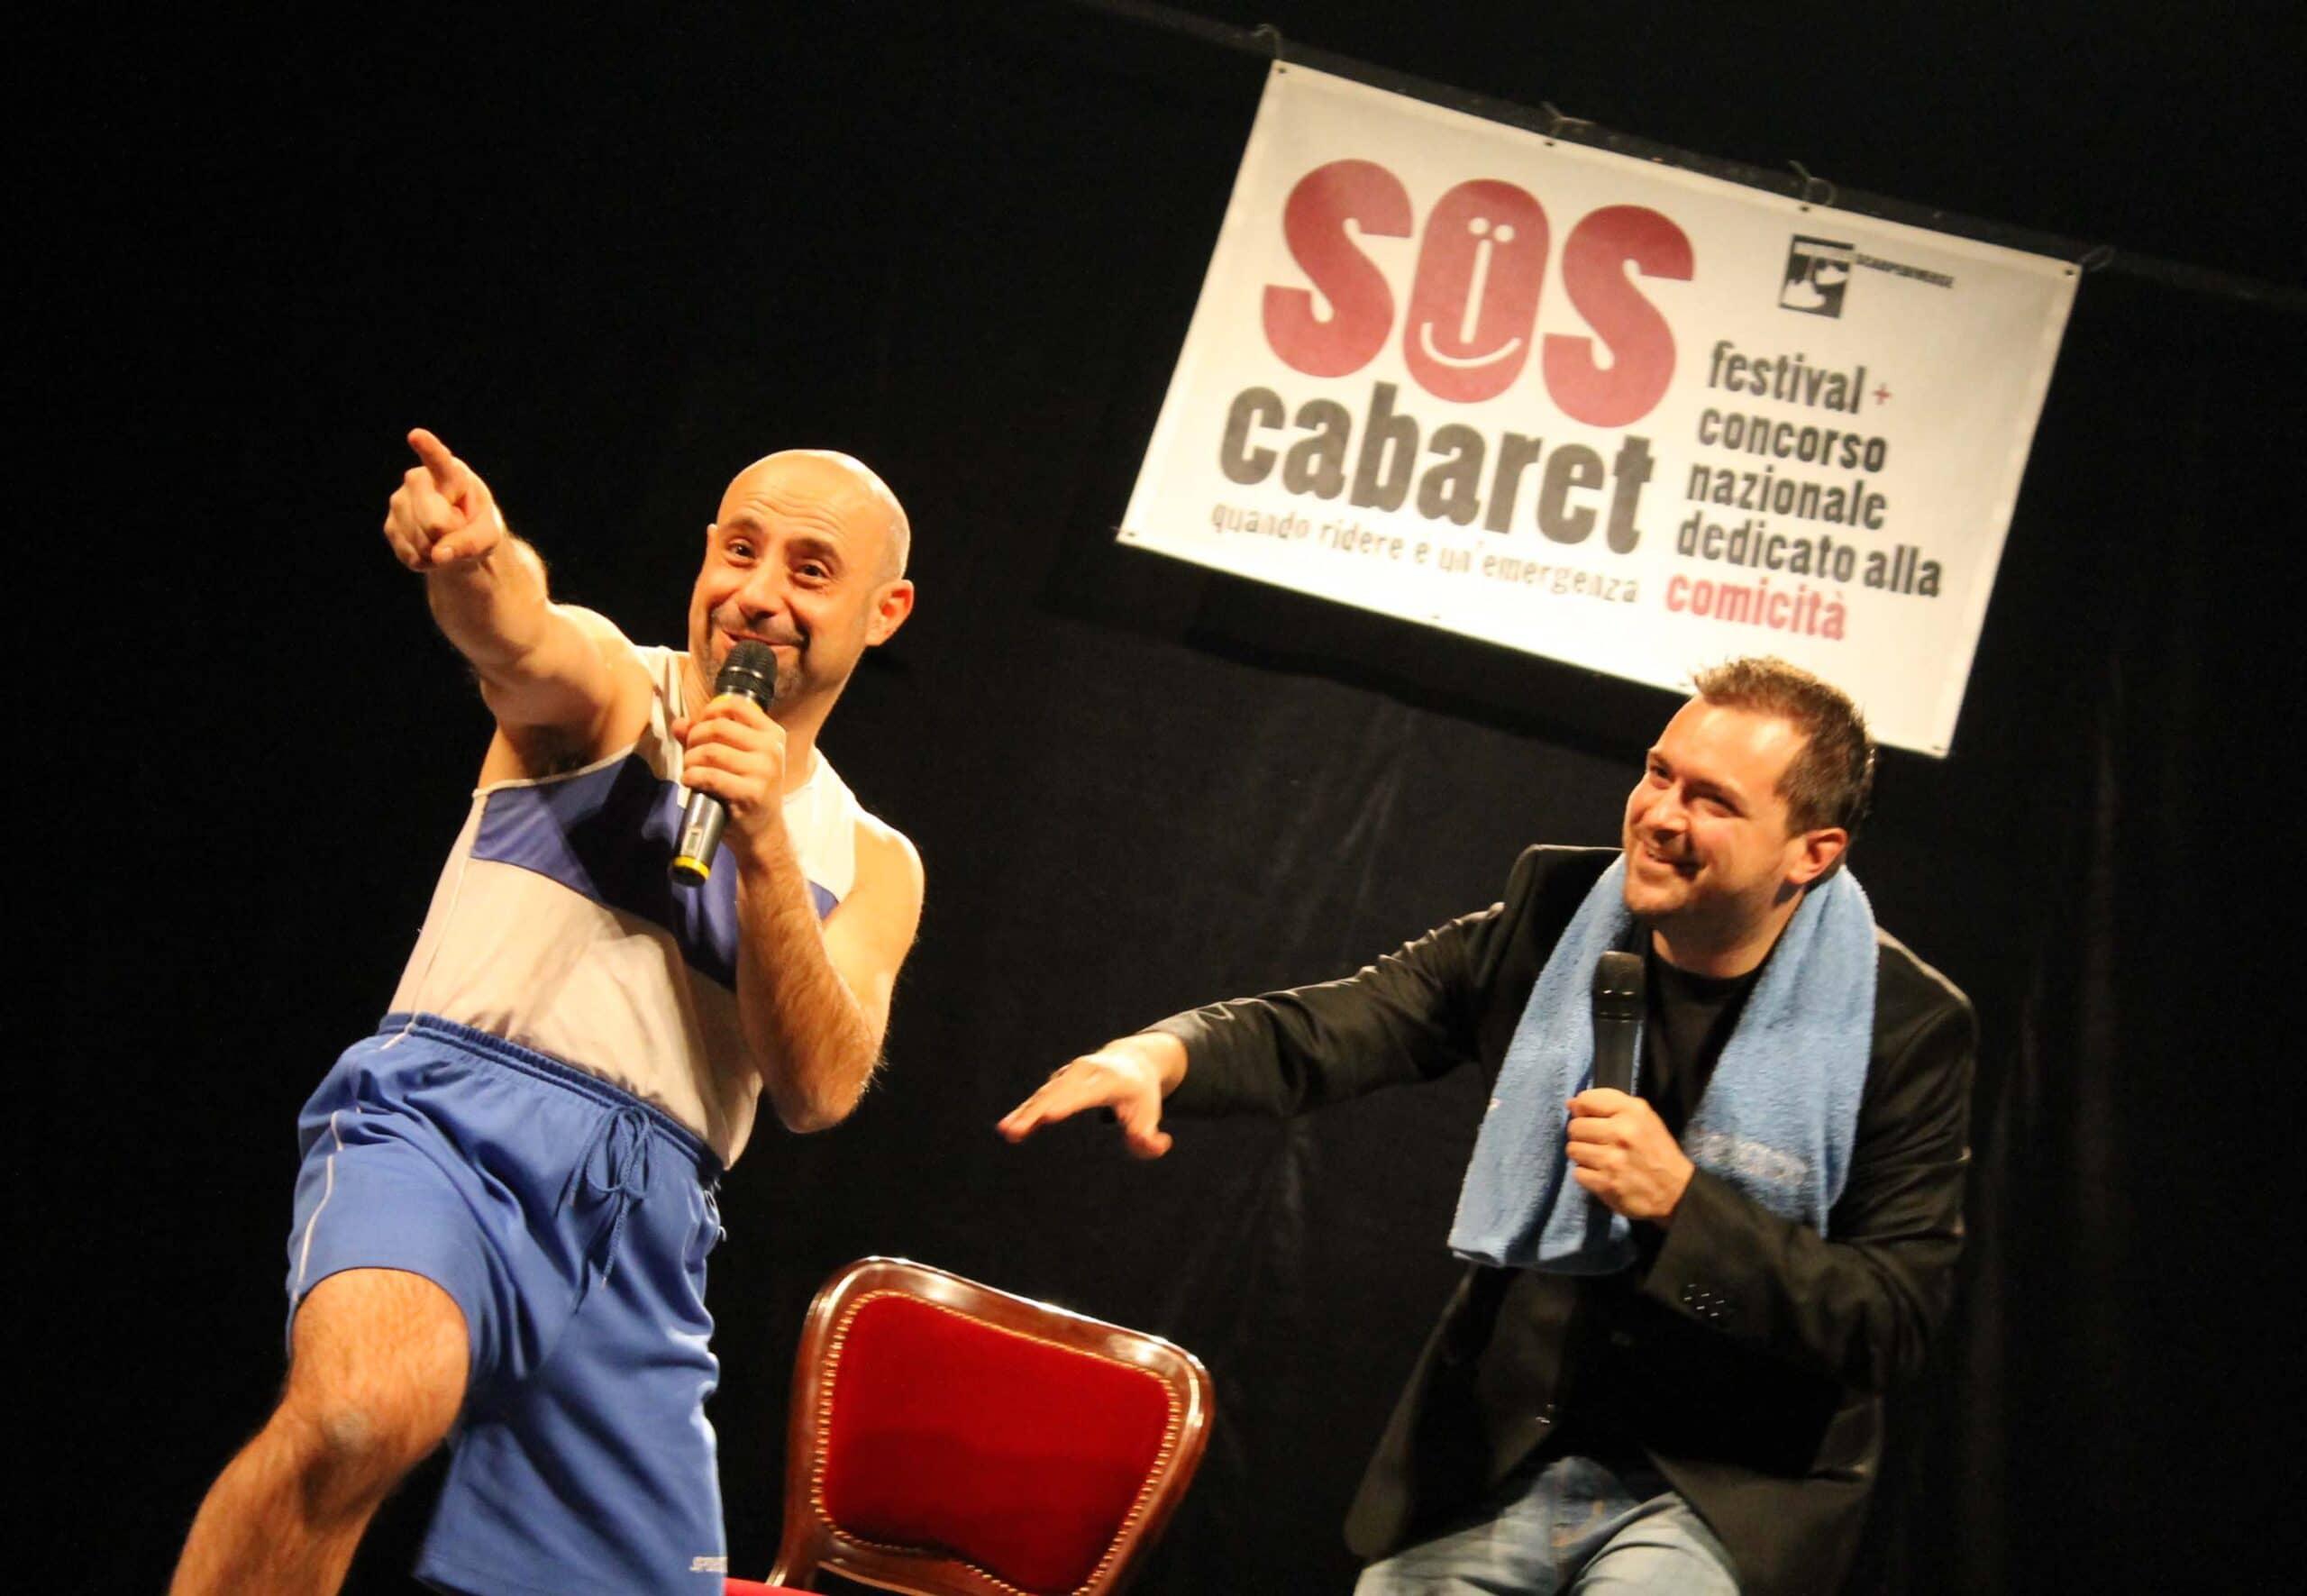 Photo of Sos Cabaret 2014, una gara tra decine di comici da tutta Italia